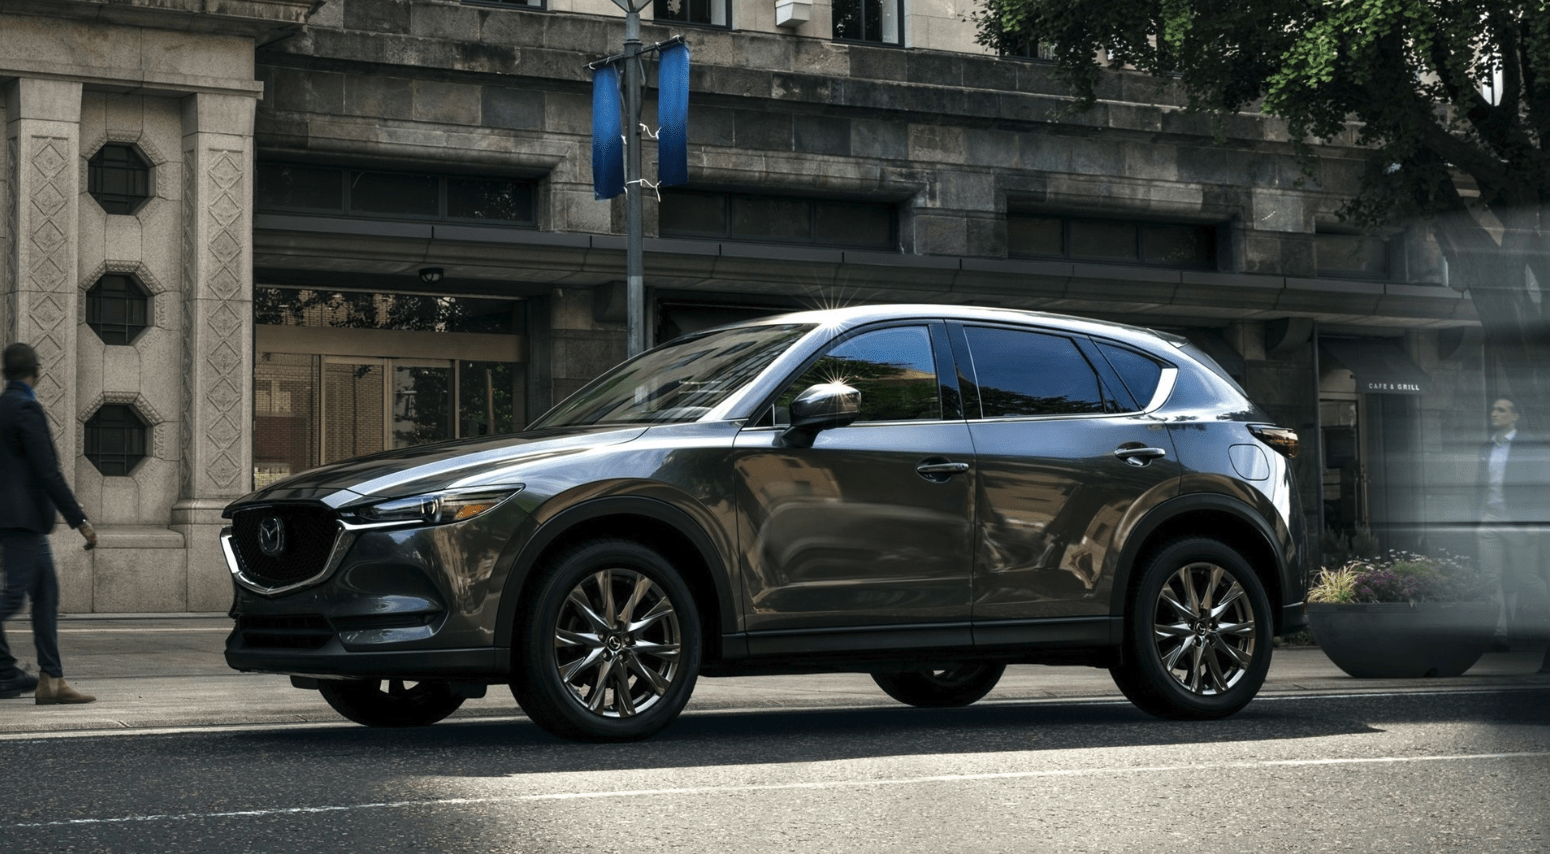 Best SUVs to Drive in Canada 2019 - Mazda CX5 2019